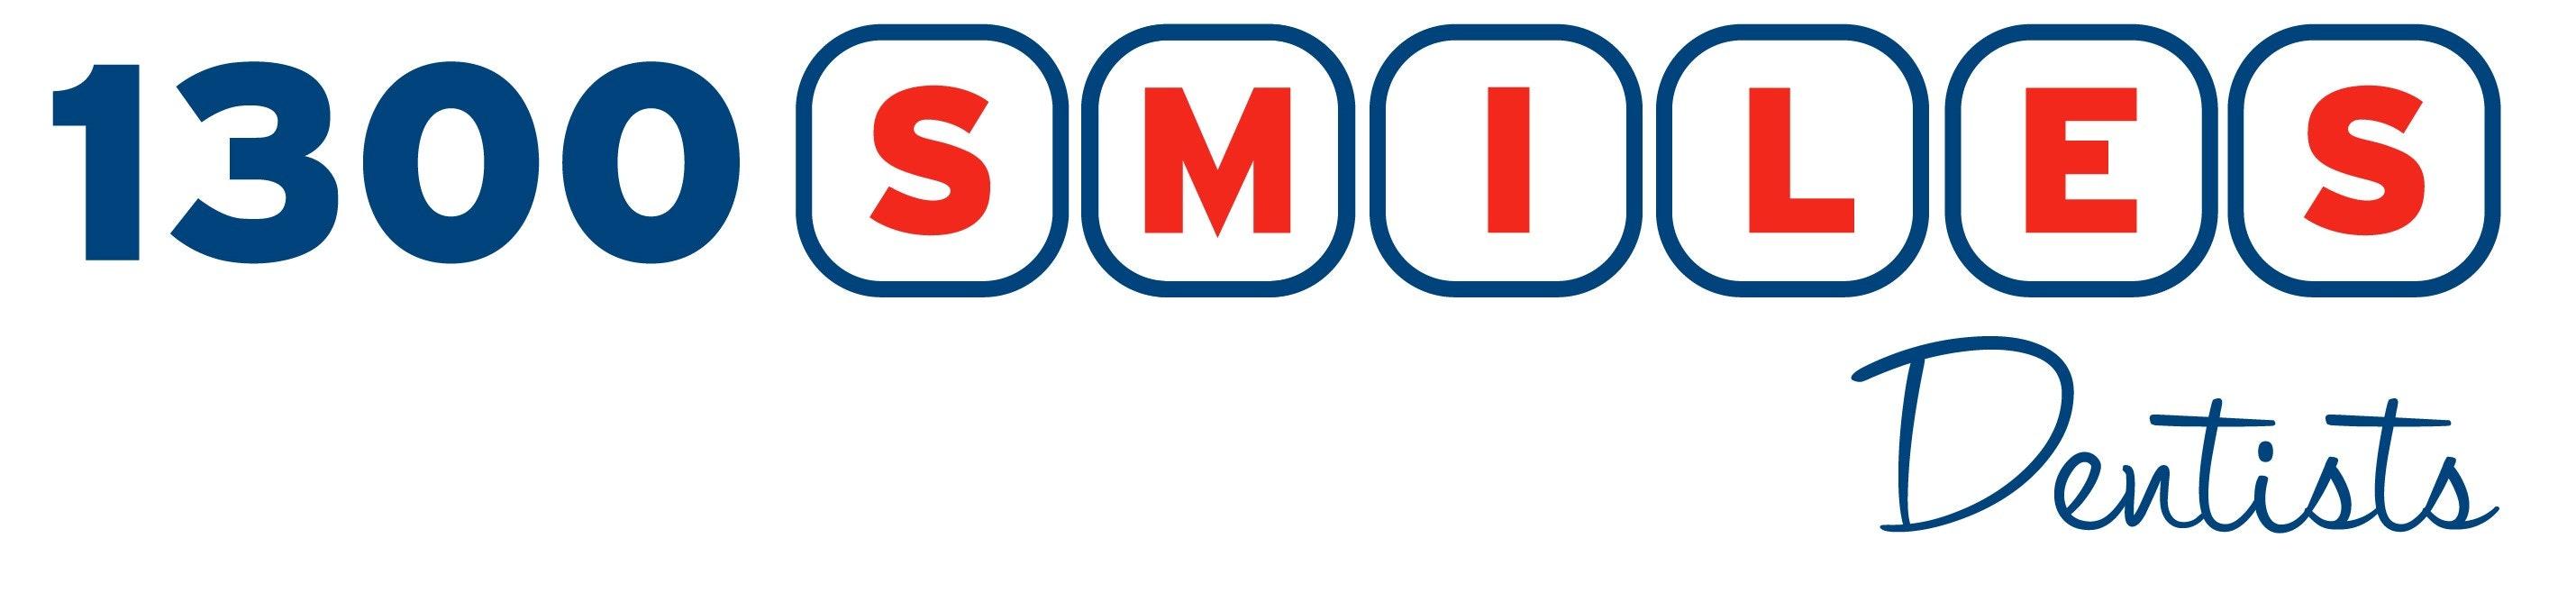 logo for 1300 Smiles - Smithfield Shopping Centre Dentists